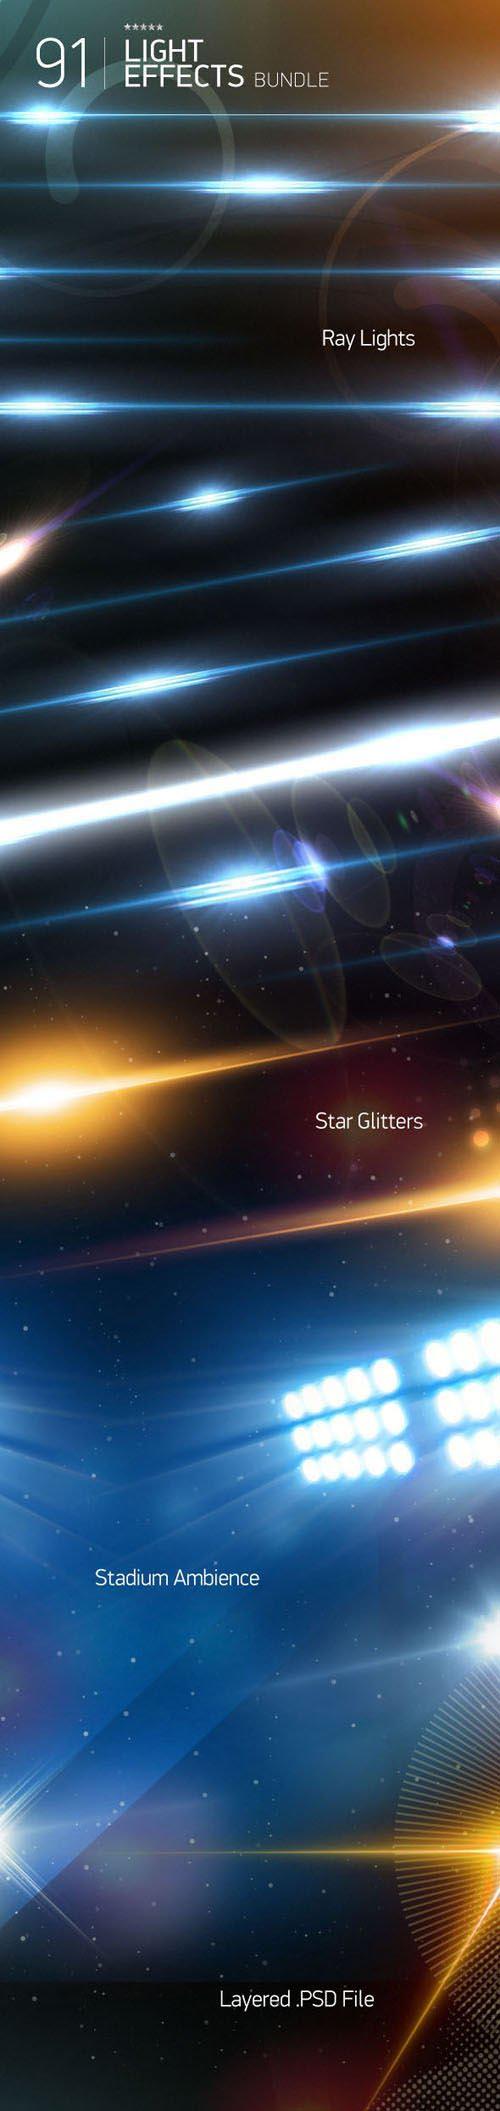 Light Effects PSD Templates Bundle